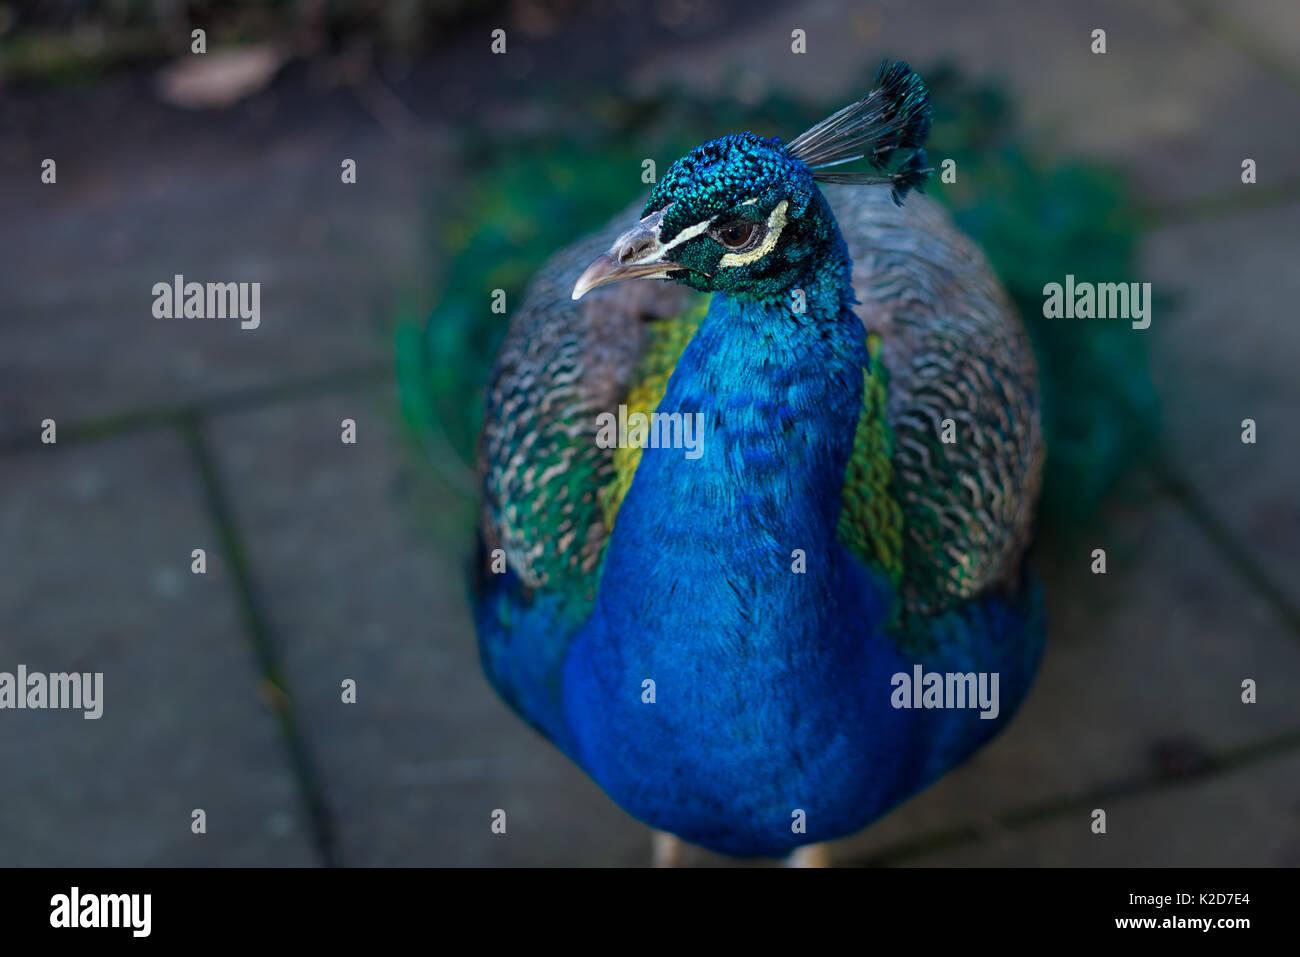 Indian peafowl (peacock, pavo cristatus) photographed in London, United Kingdom - Stock Image